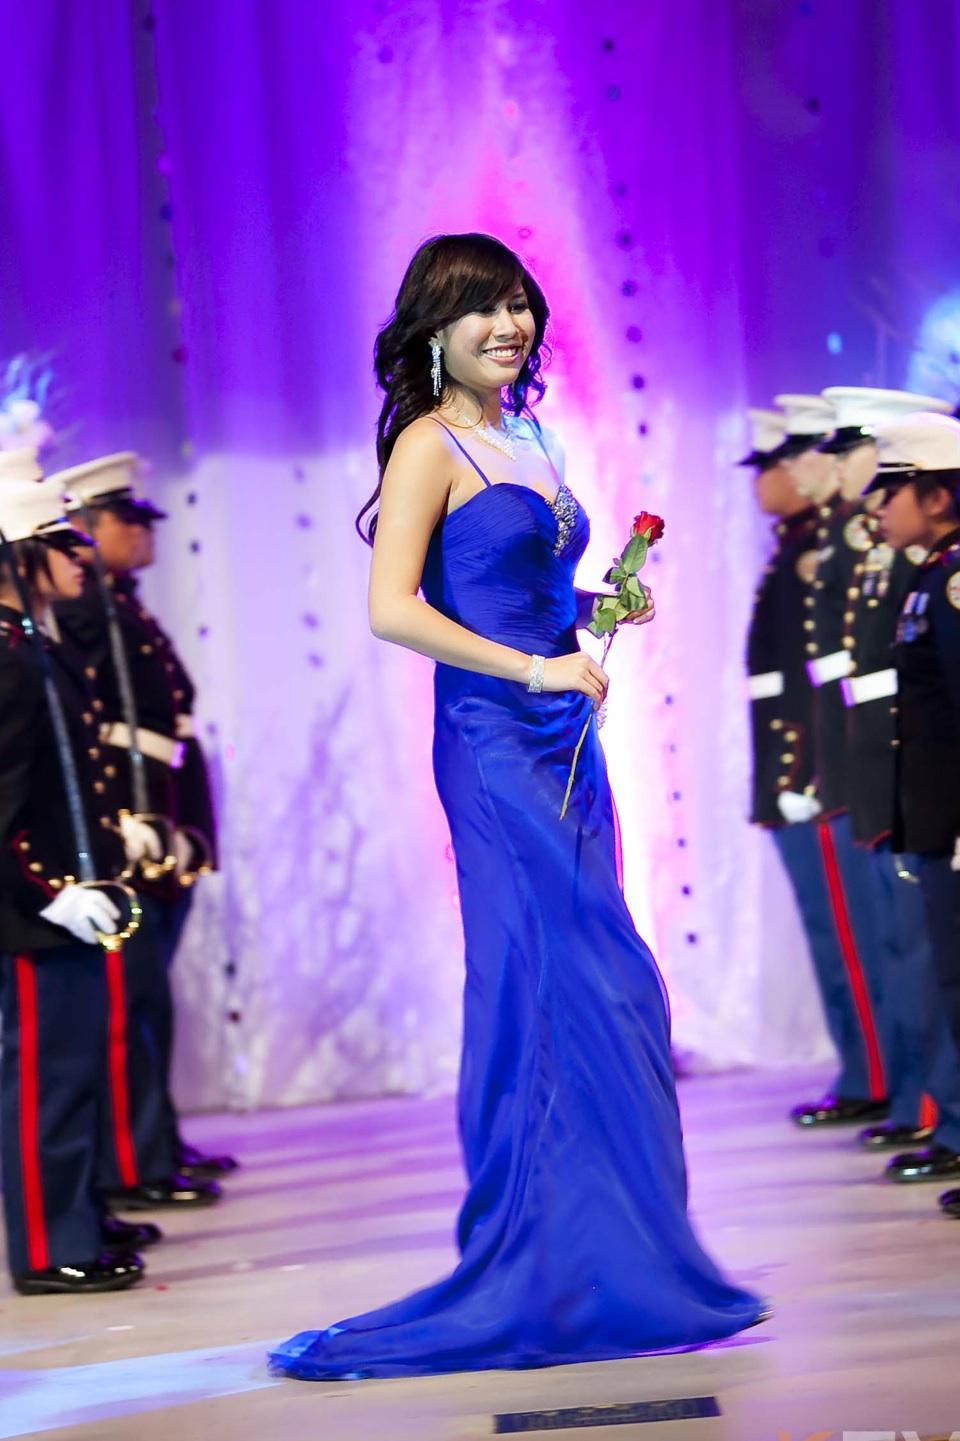 Miss Vietnam - Hoa Hau Ao Dai Bac Cali 2010 - Pageant Day - Image 081